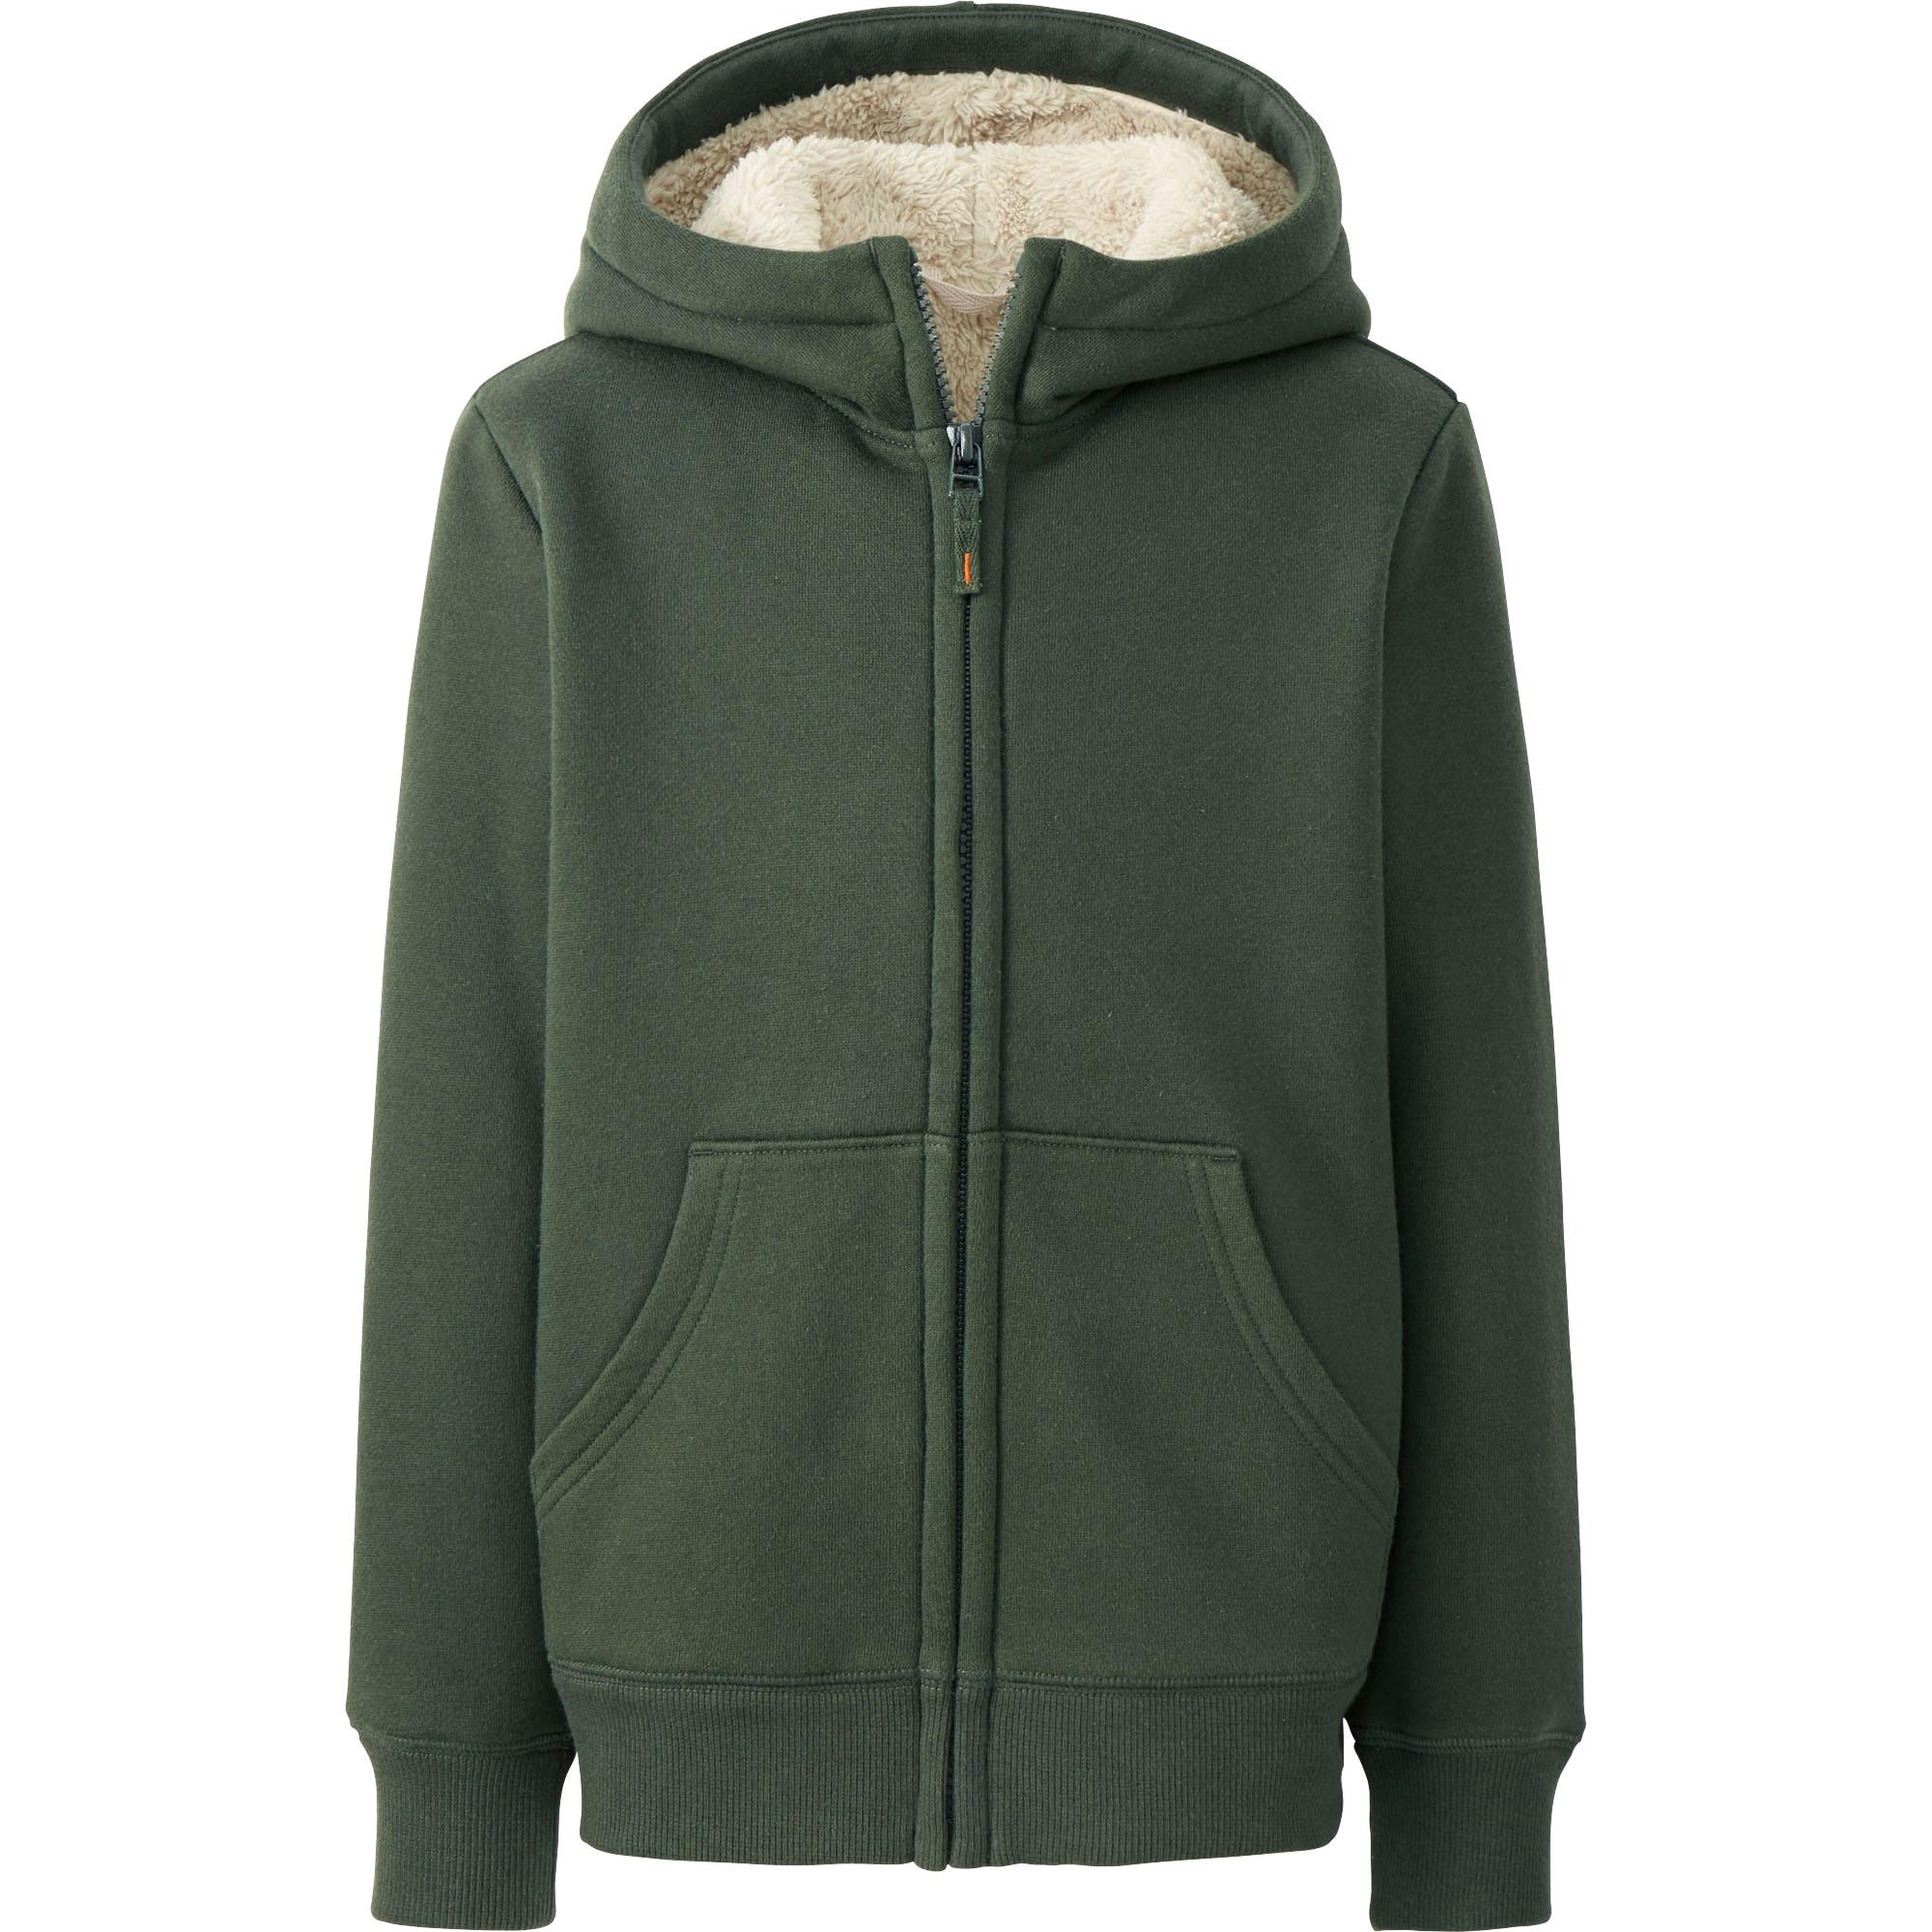 Kids Pile Lined Sweat Long Sleeve Full Zip Hooded Jacket